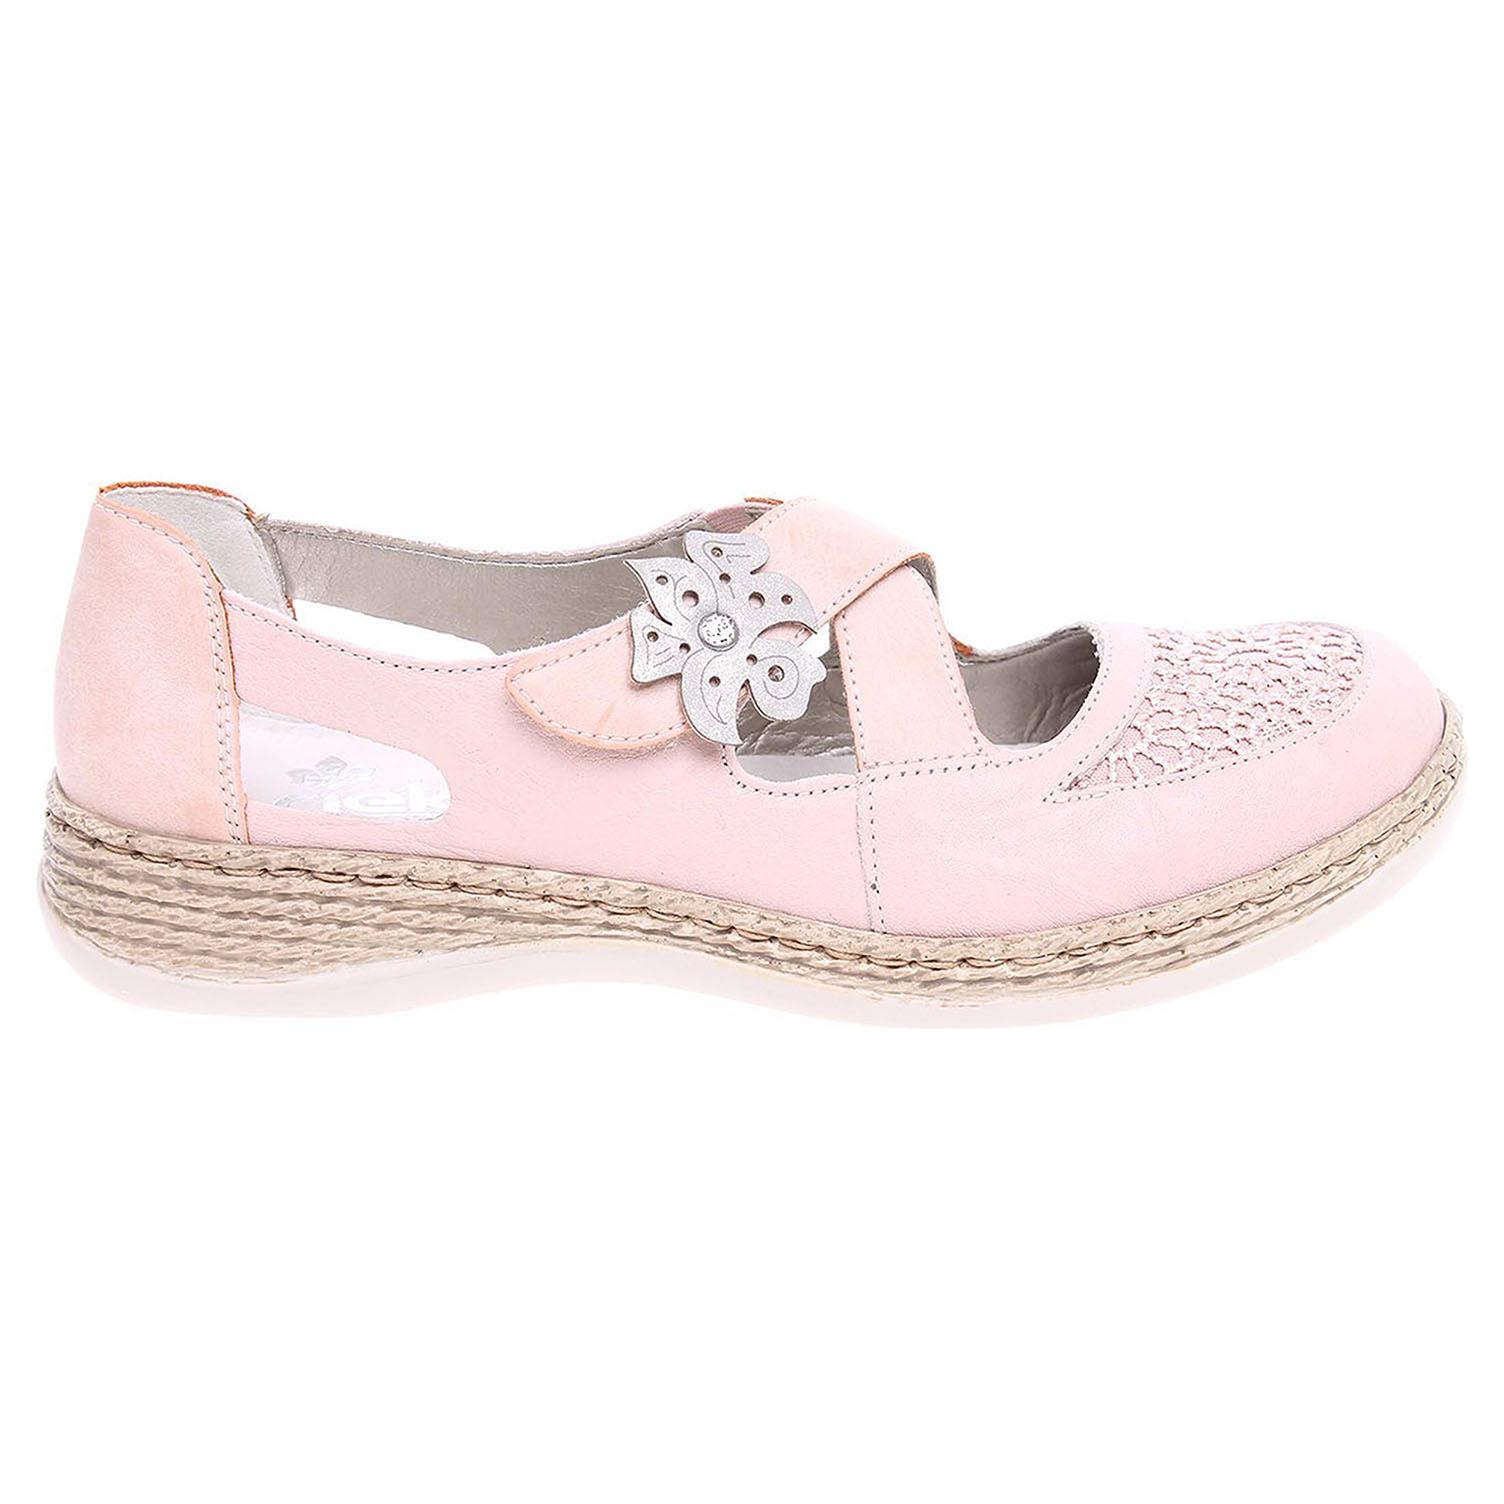 Ecco Rieker dámské sandály 464H0-31 růžové 23801121